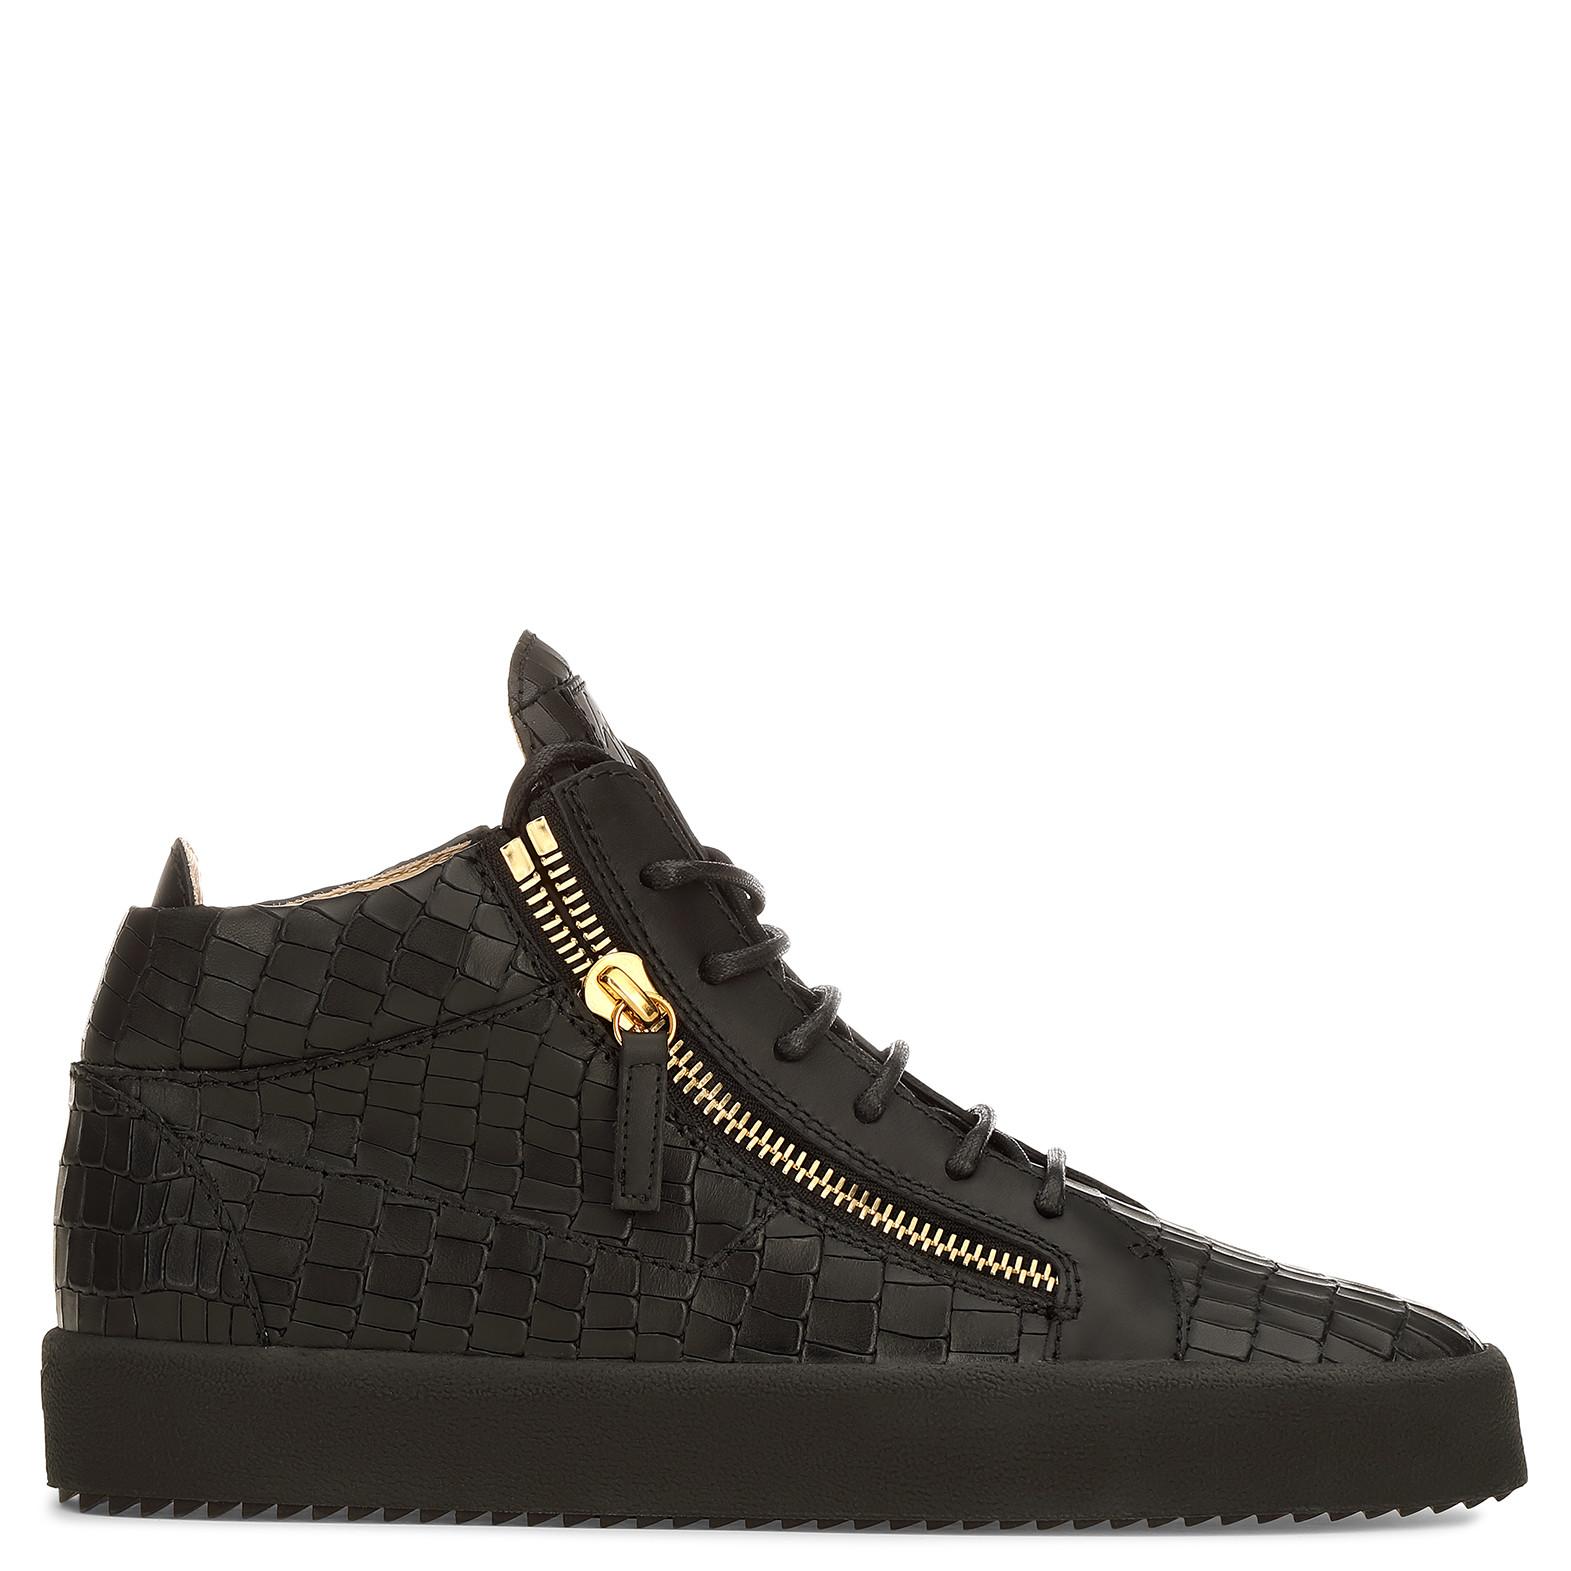 Giuseppe ZanottiCrocodile-embossed leather low-top sneaker KRISS cirZqWoQ7f